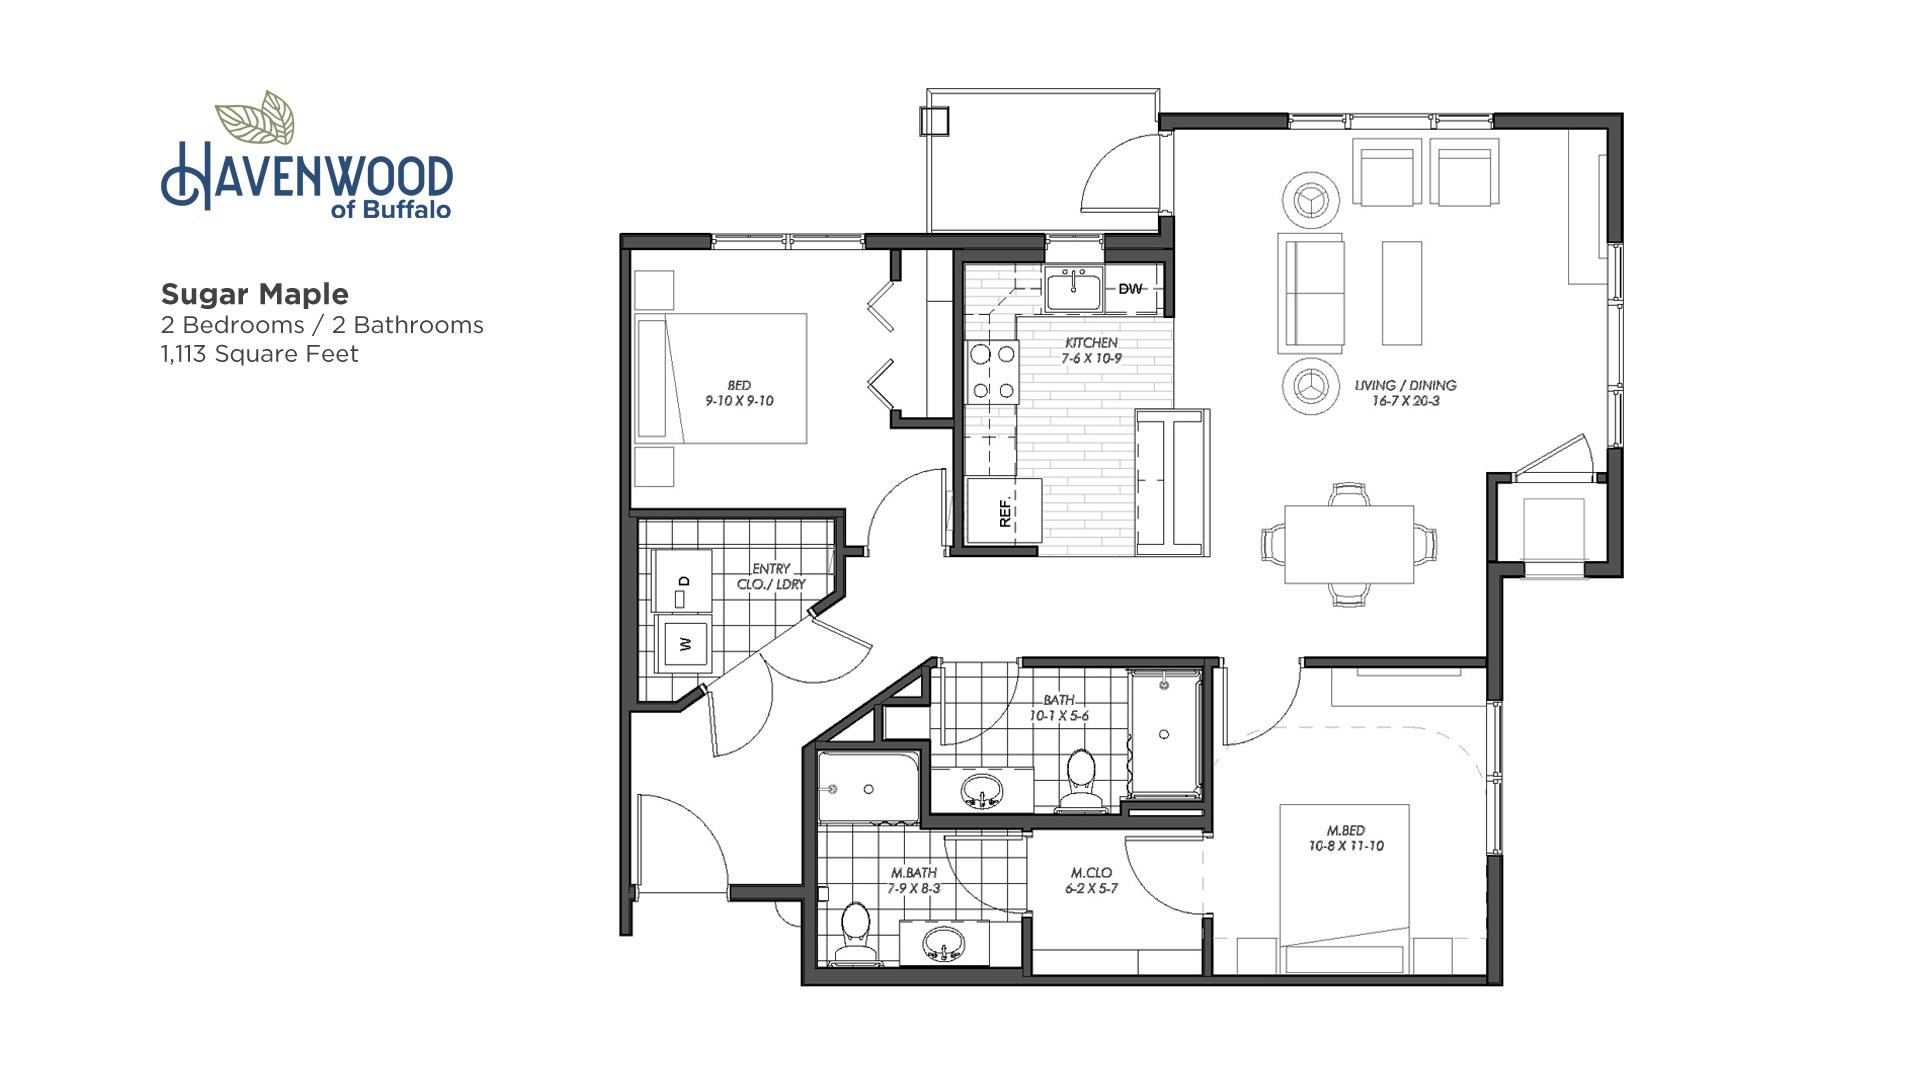 Havenwood of Buffalo Sugar Maple Floor Plan